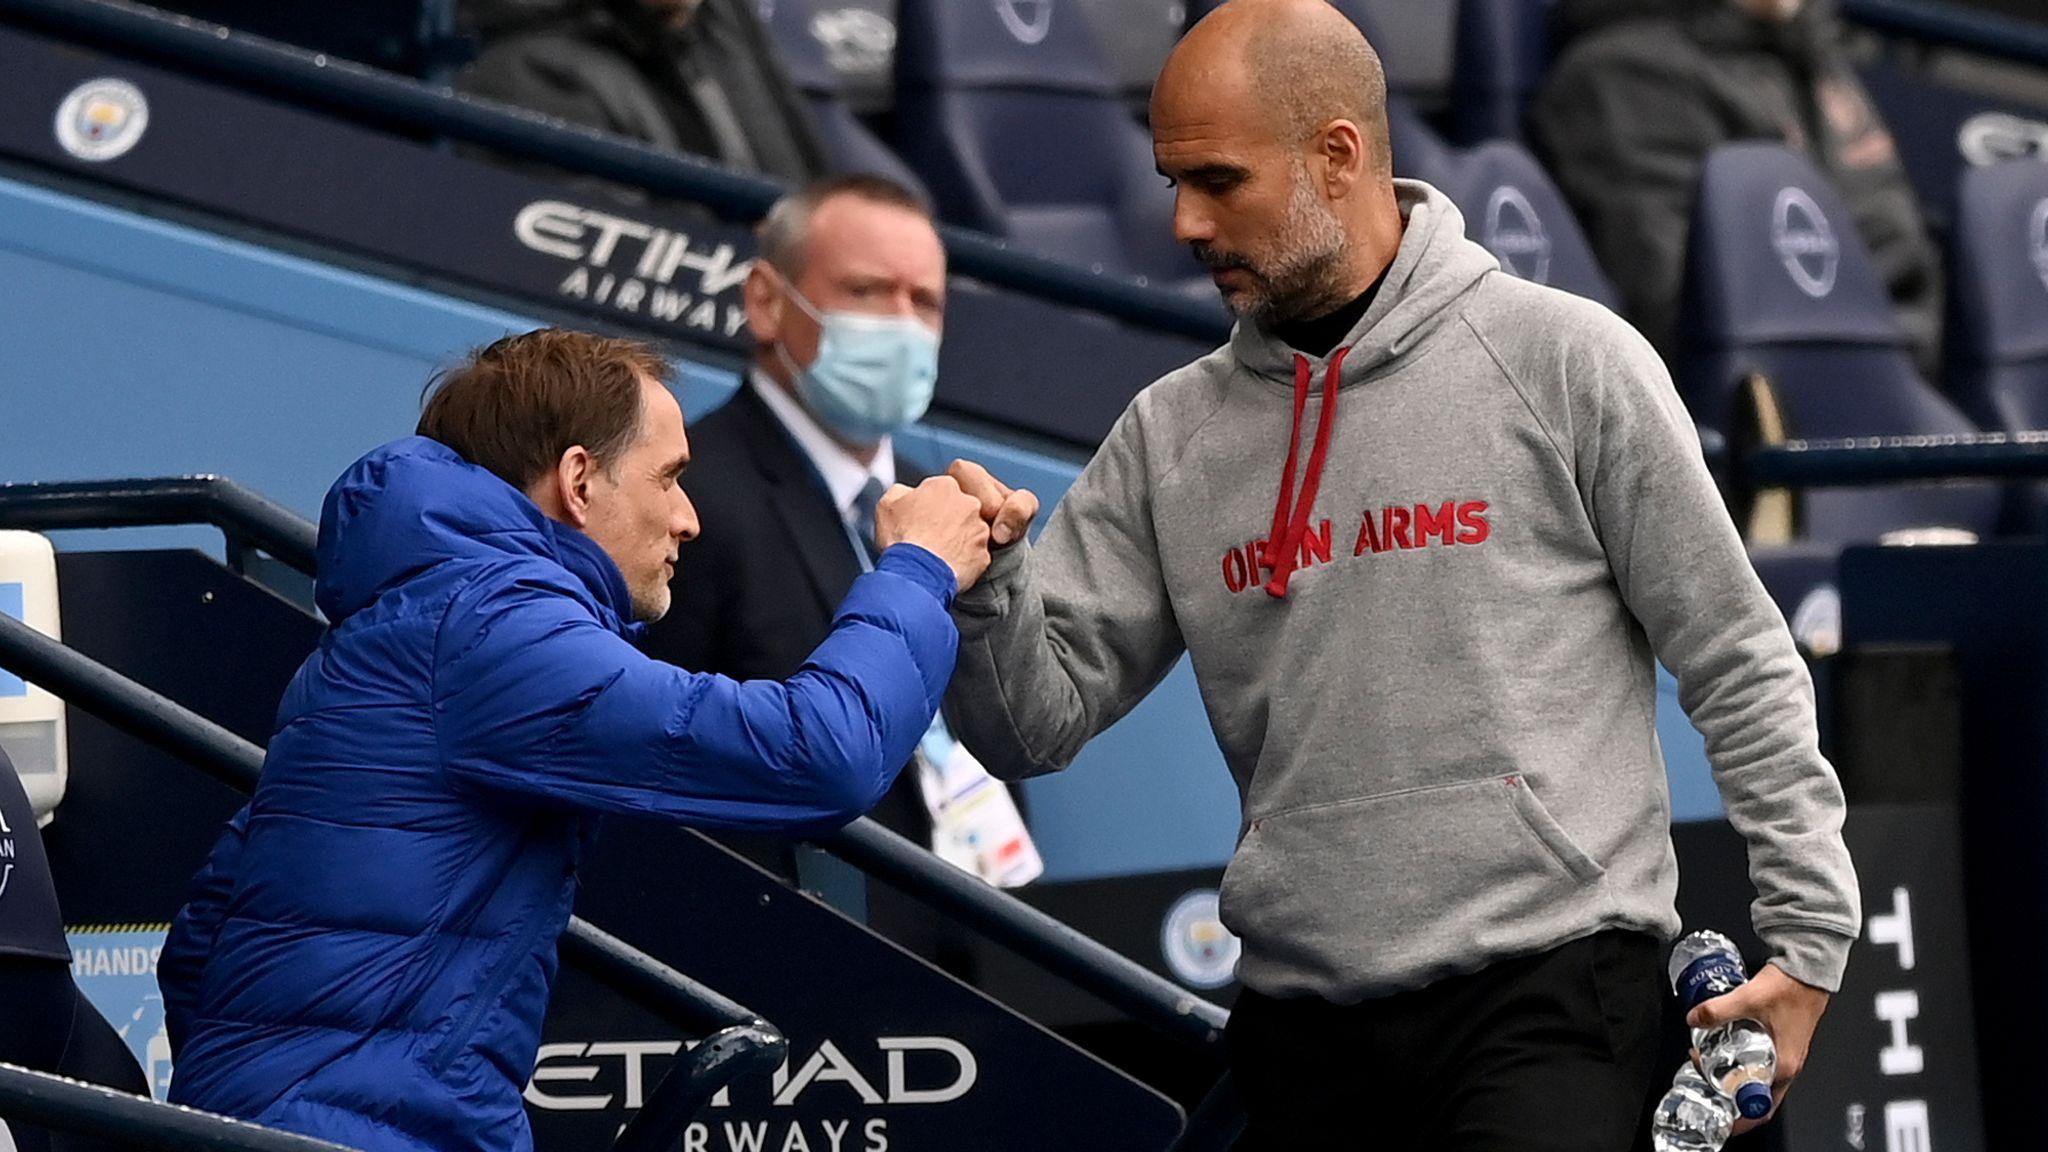 Pep Guardiola and Thomas Tuchel